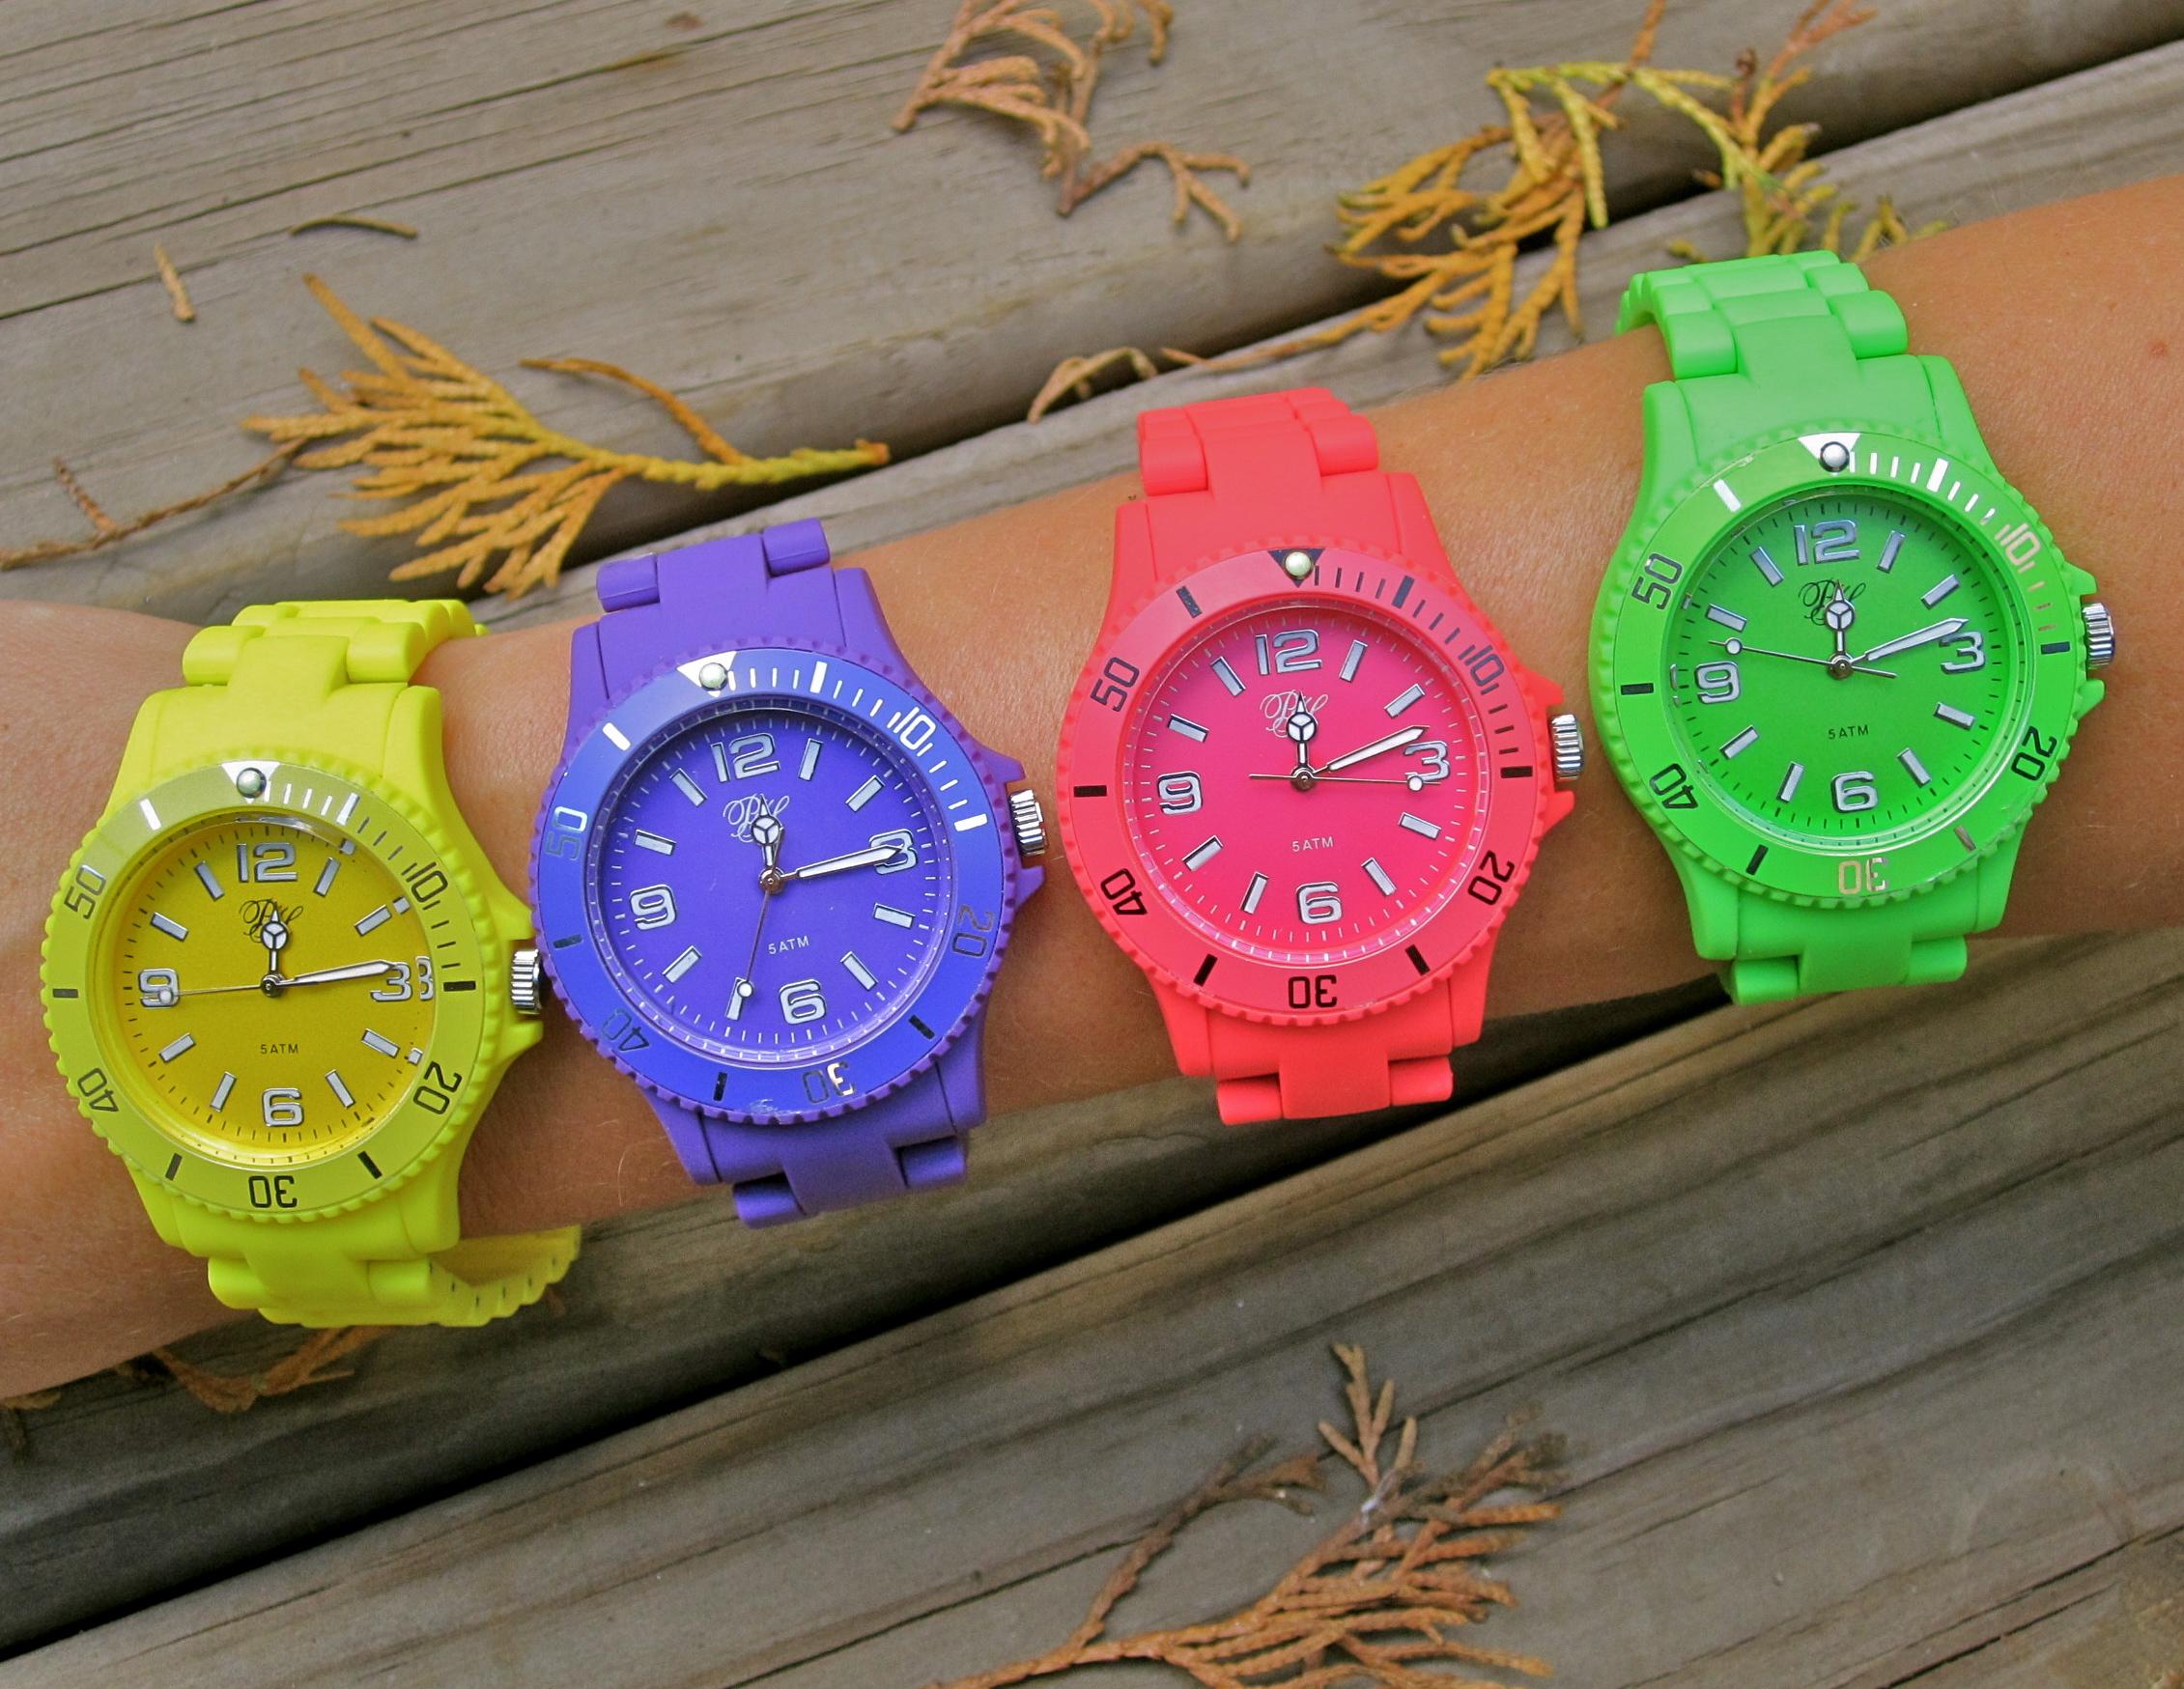 ¿¿¿¿Deseáis un reloj PdH Sport????